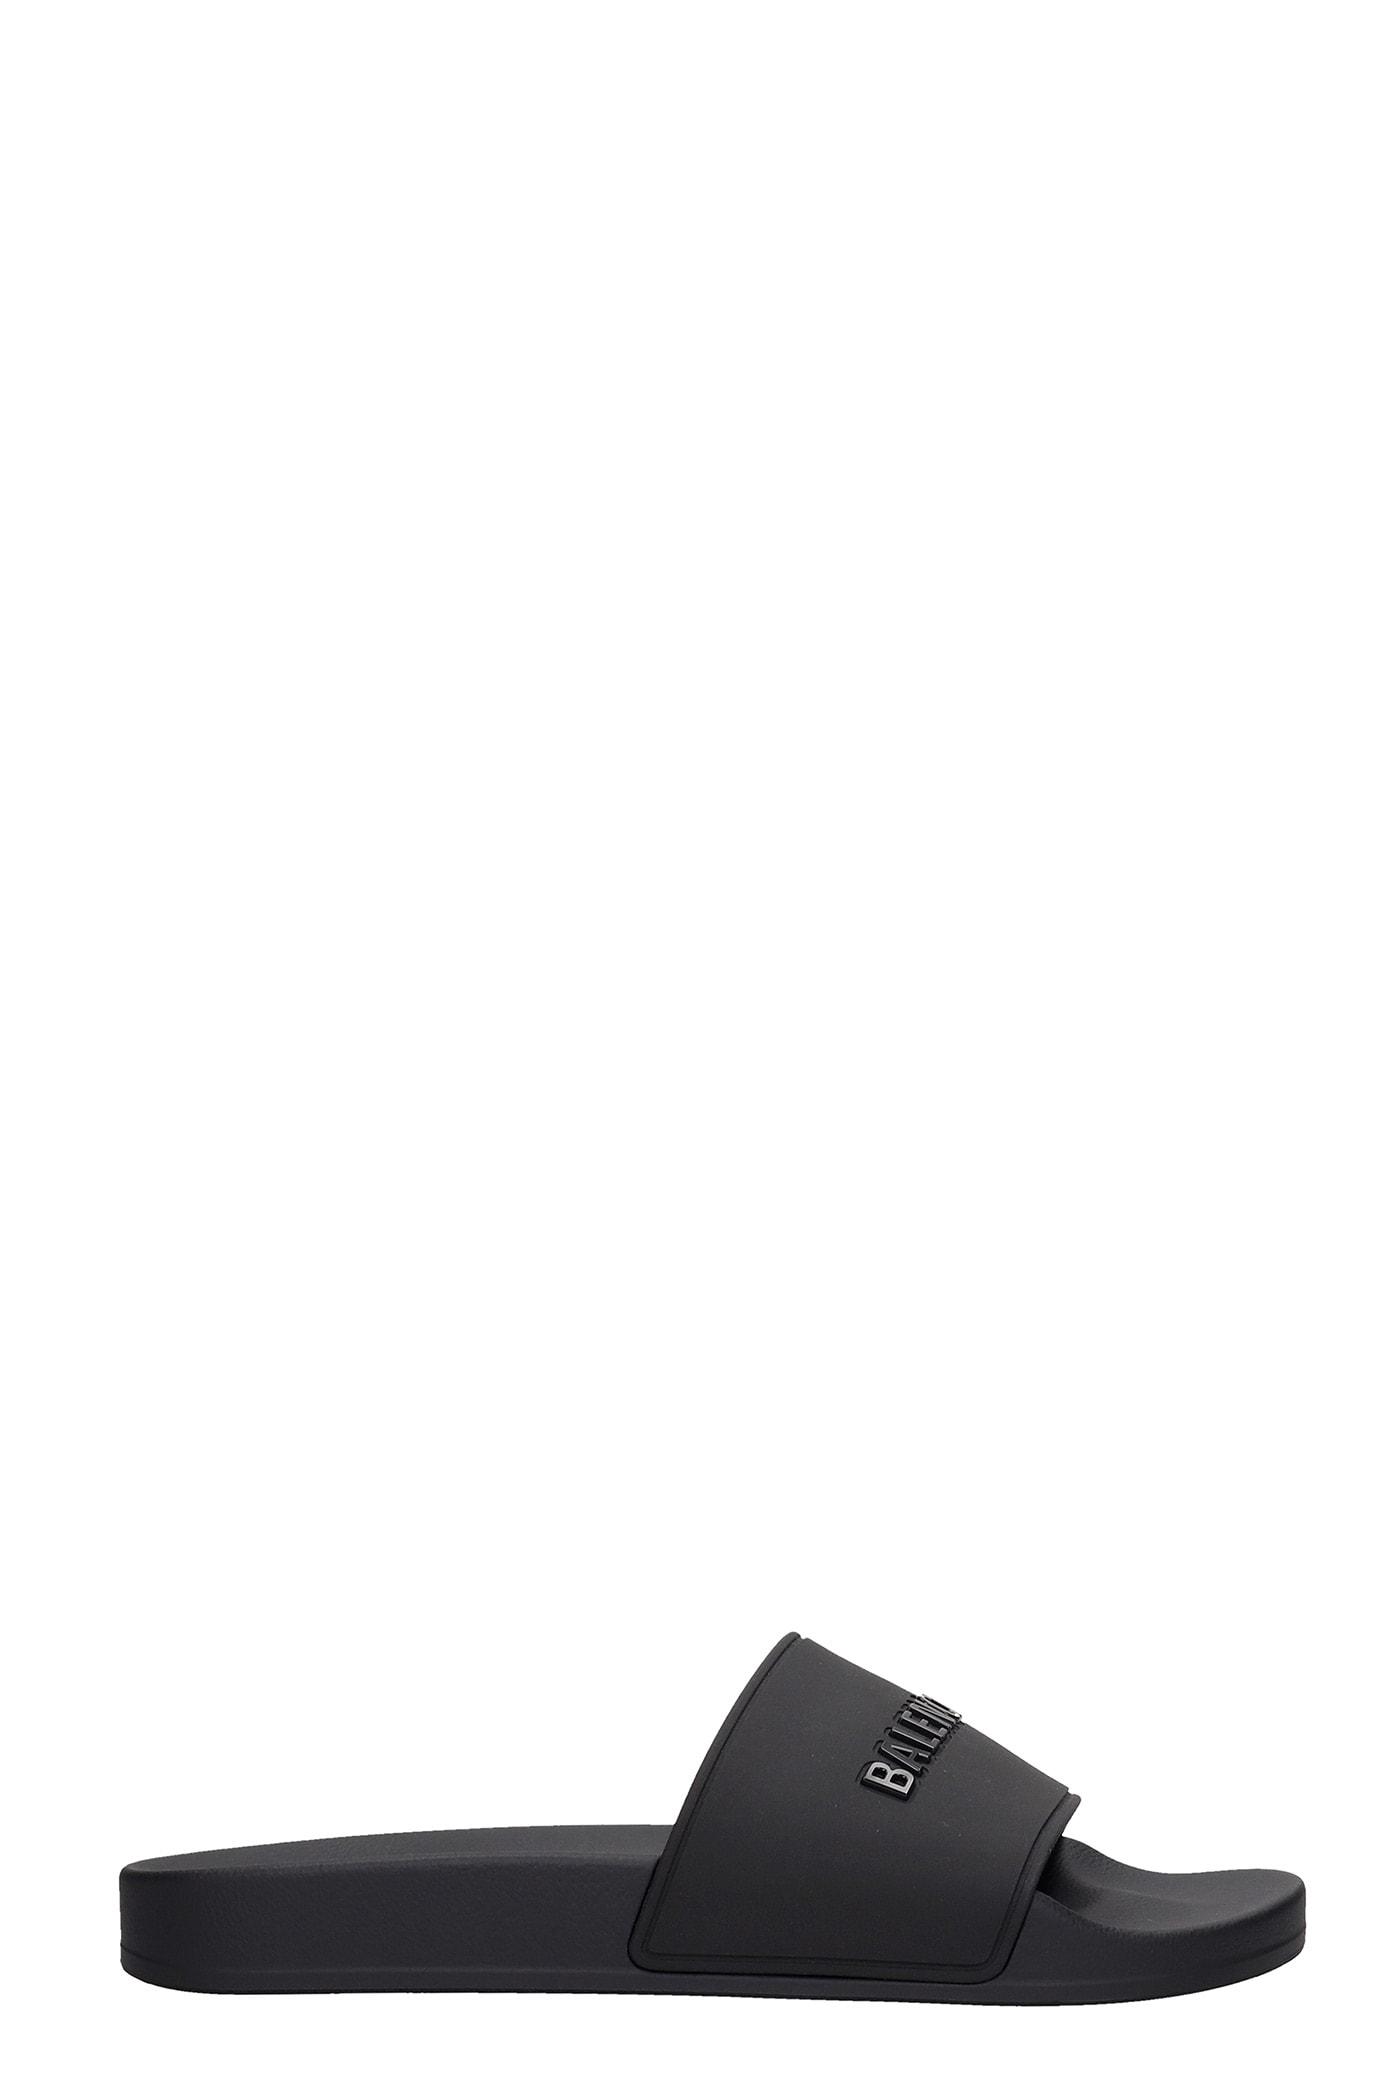 Buy Balenciaga Flats In Black Rubber/plasic online, shop Balenciaga shoes with free shipping